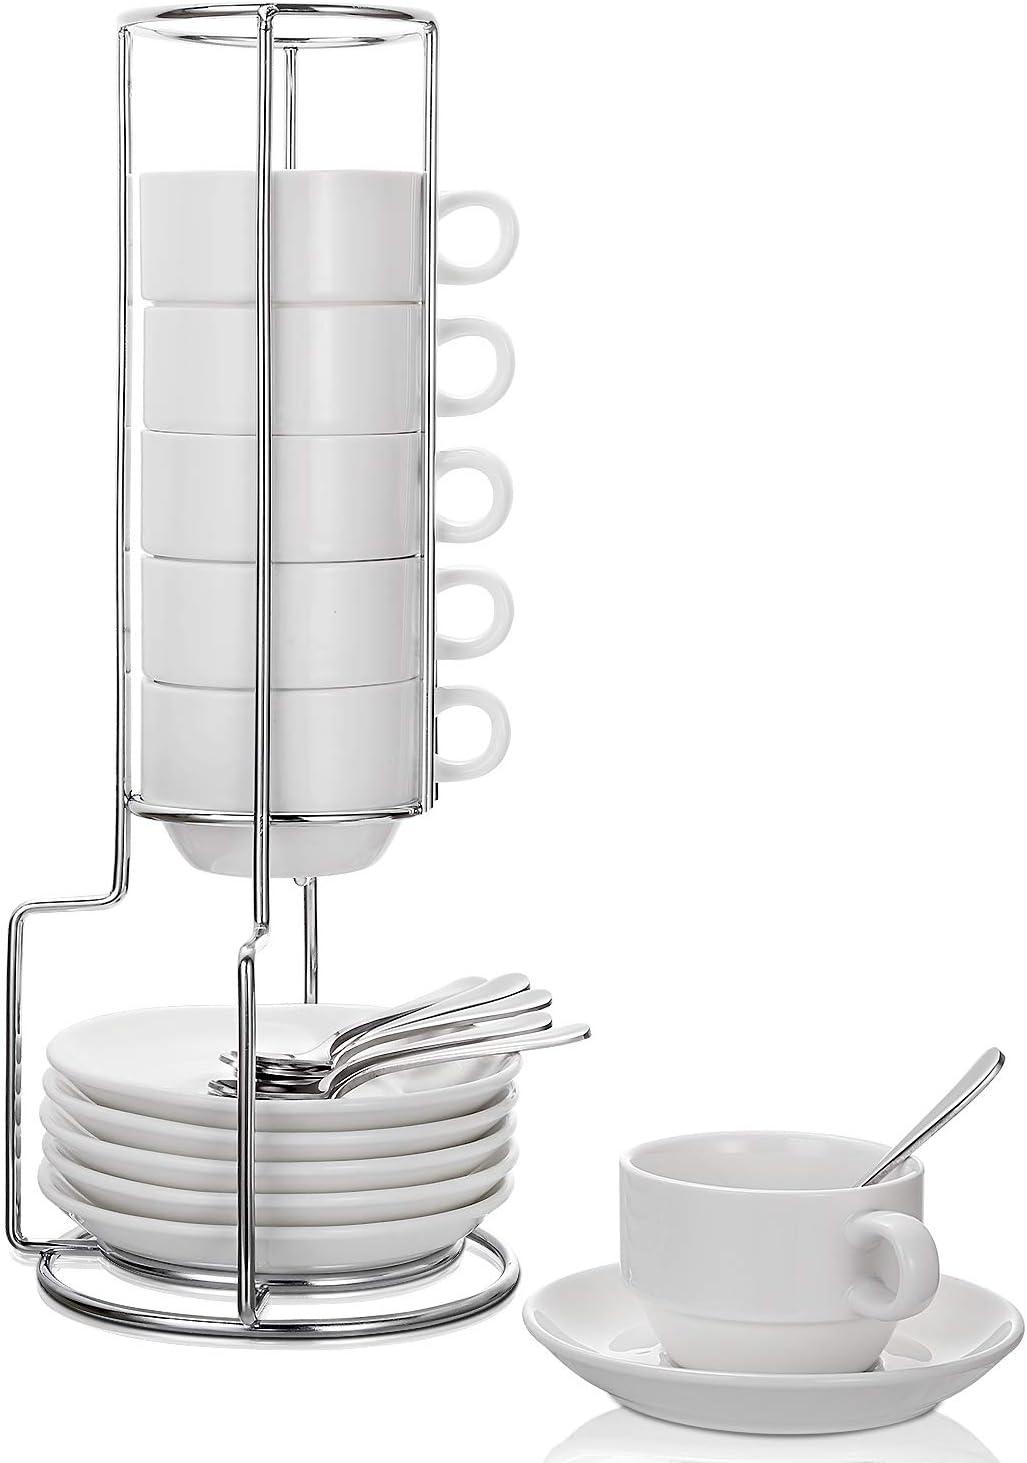 Aozita Espresso Cups and Saucers with Espresso Spoons, Stand Rack, 19-piece Porcelain Stackable Espresso Mugs, 2.5-Ounce Demitasse Cups for Espresso, Latte, Cafe Mocha